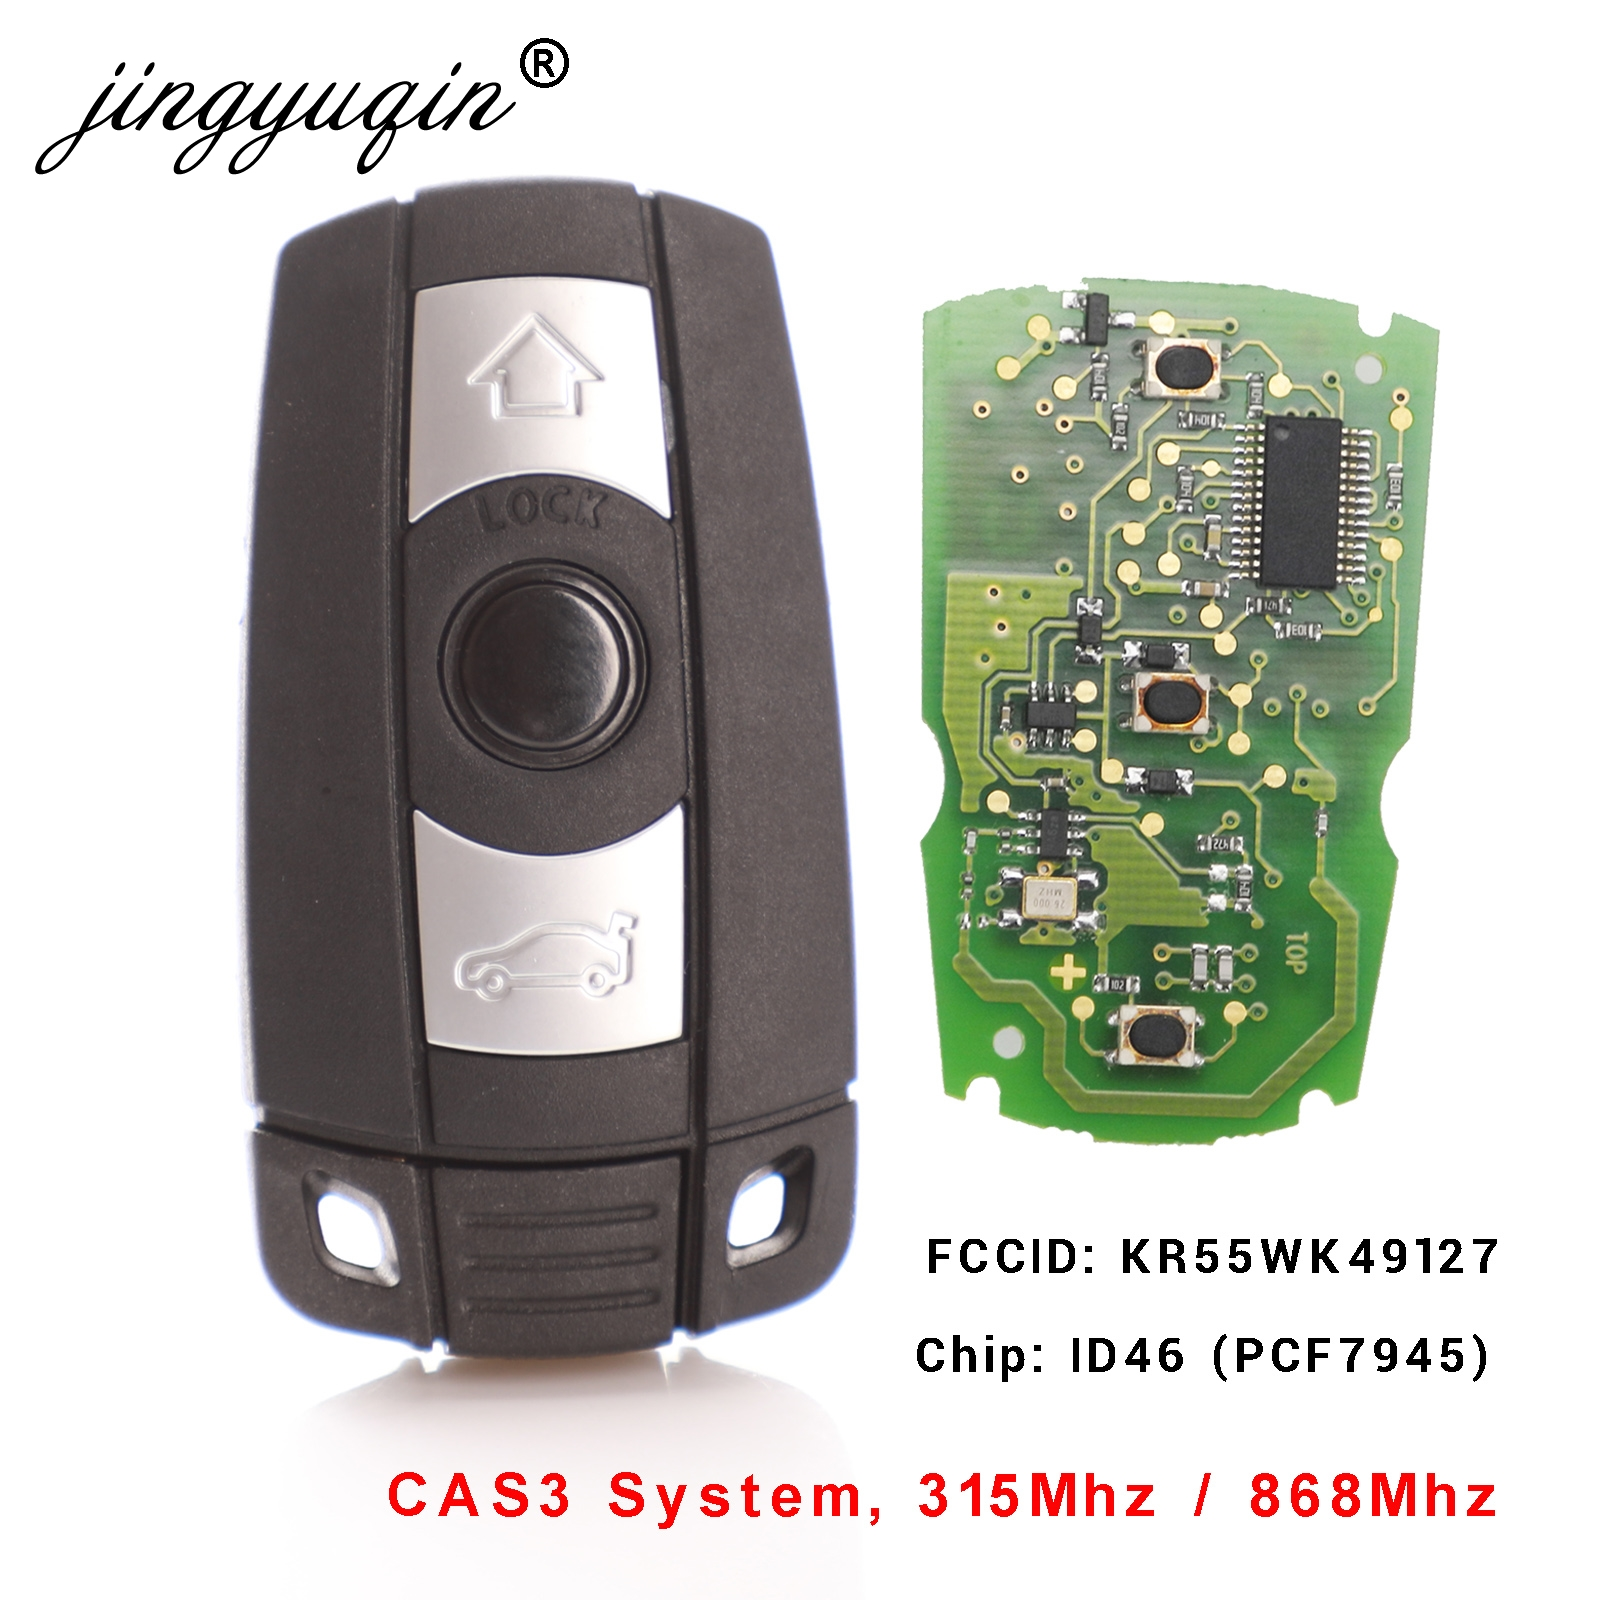 3 Button Remote Car Key 433MHZ ID7944 Chip for BMW 1 3 5 6 7 Series X5 X6 Z4